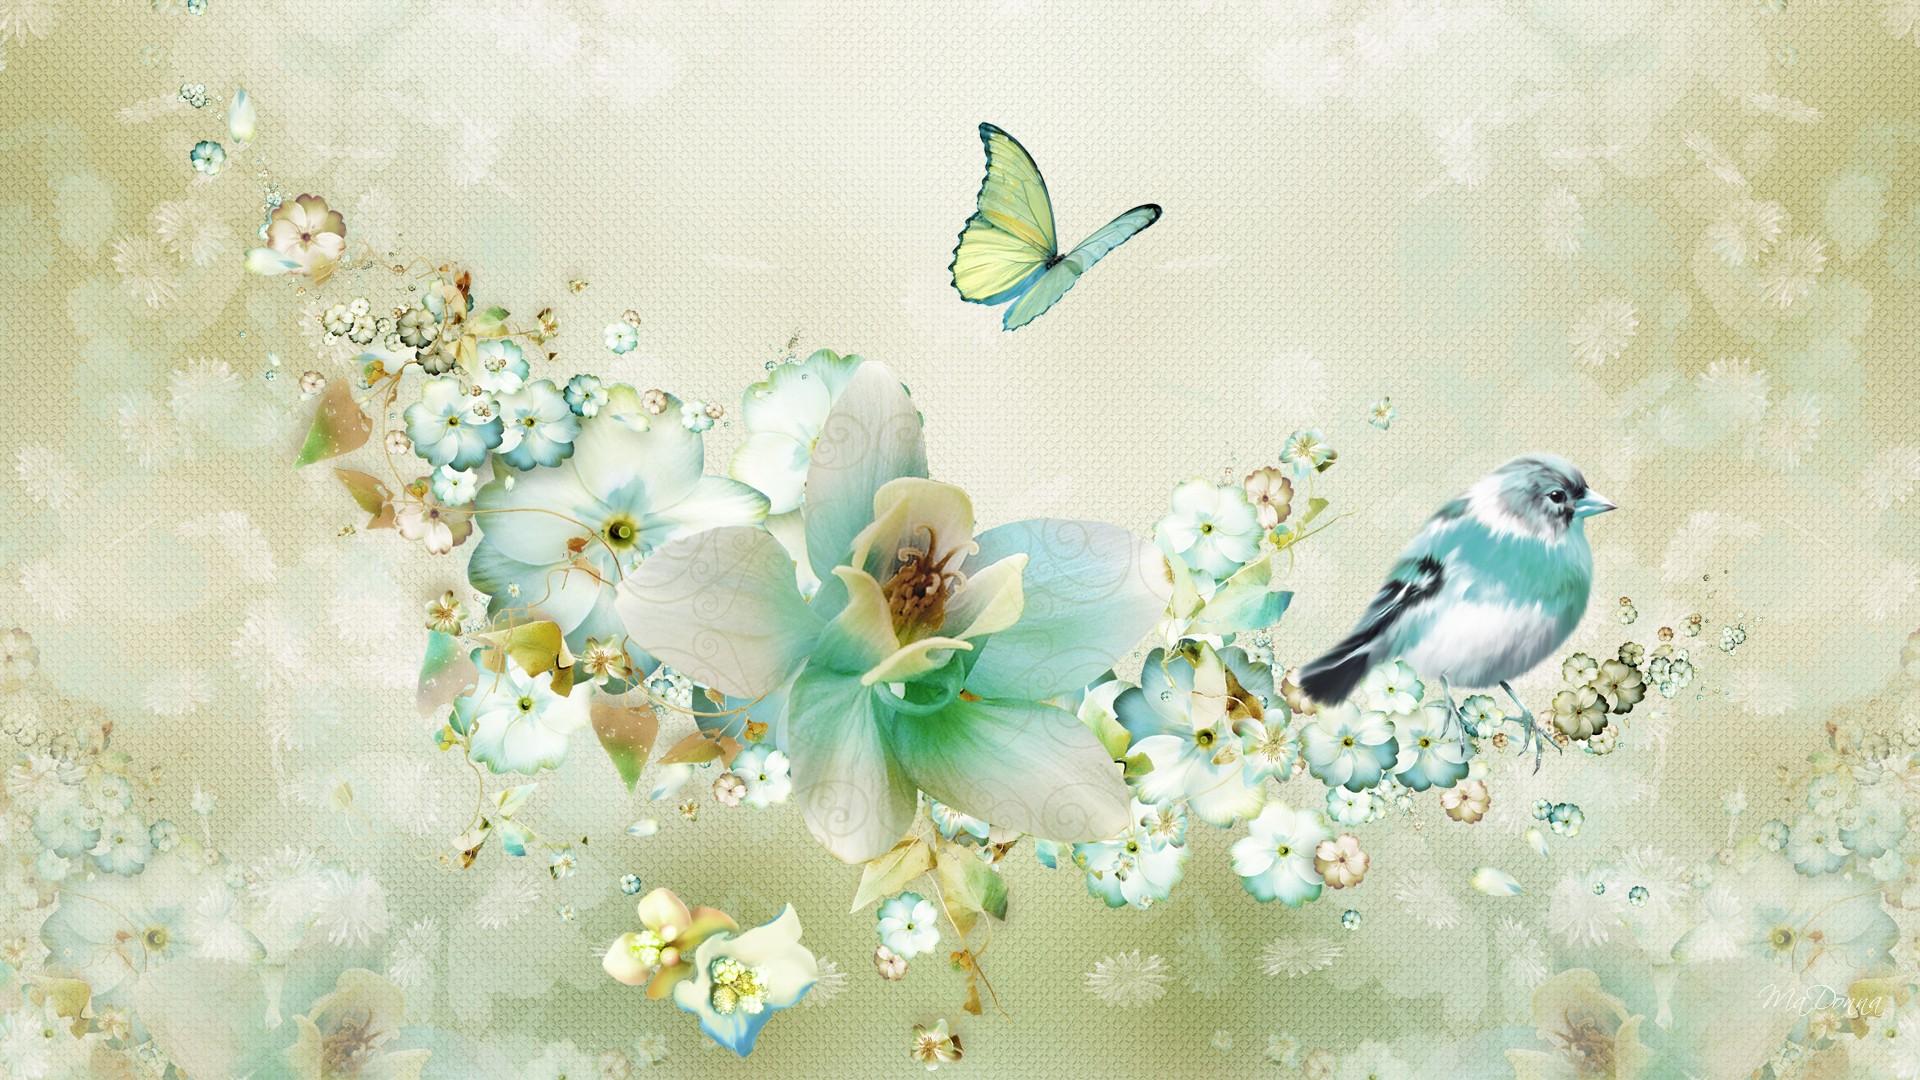 графика бабочки цветы вода graphics butterfly flowers water  № 1313448 бесплатно